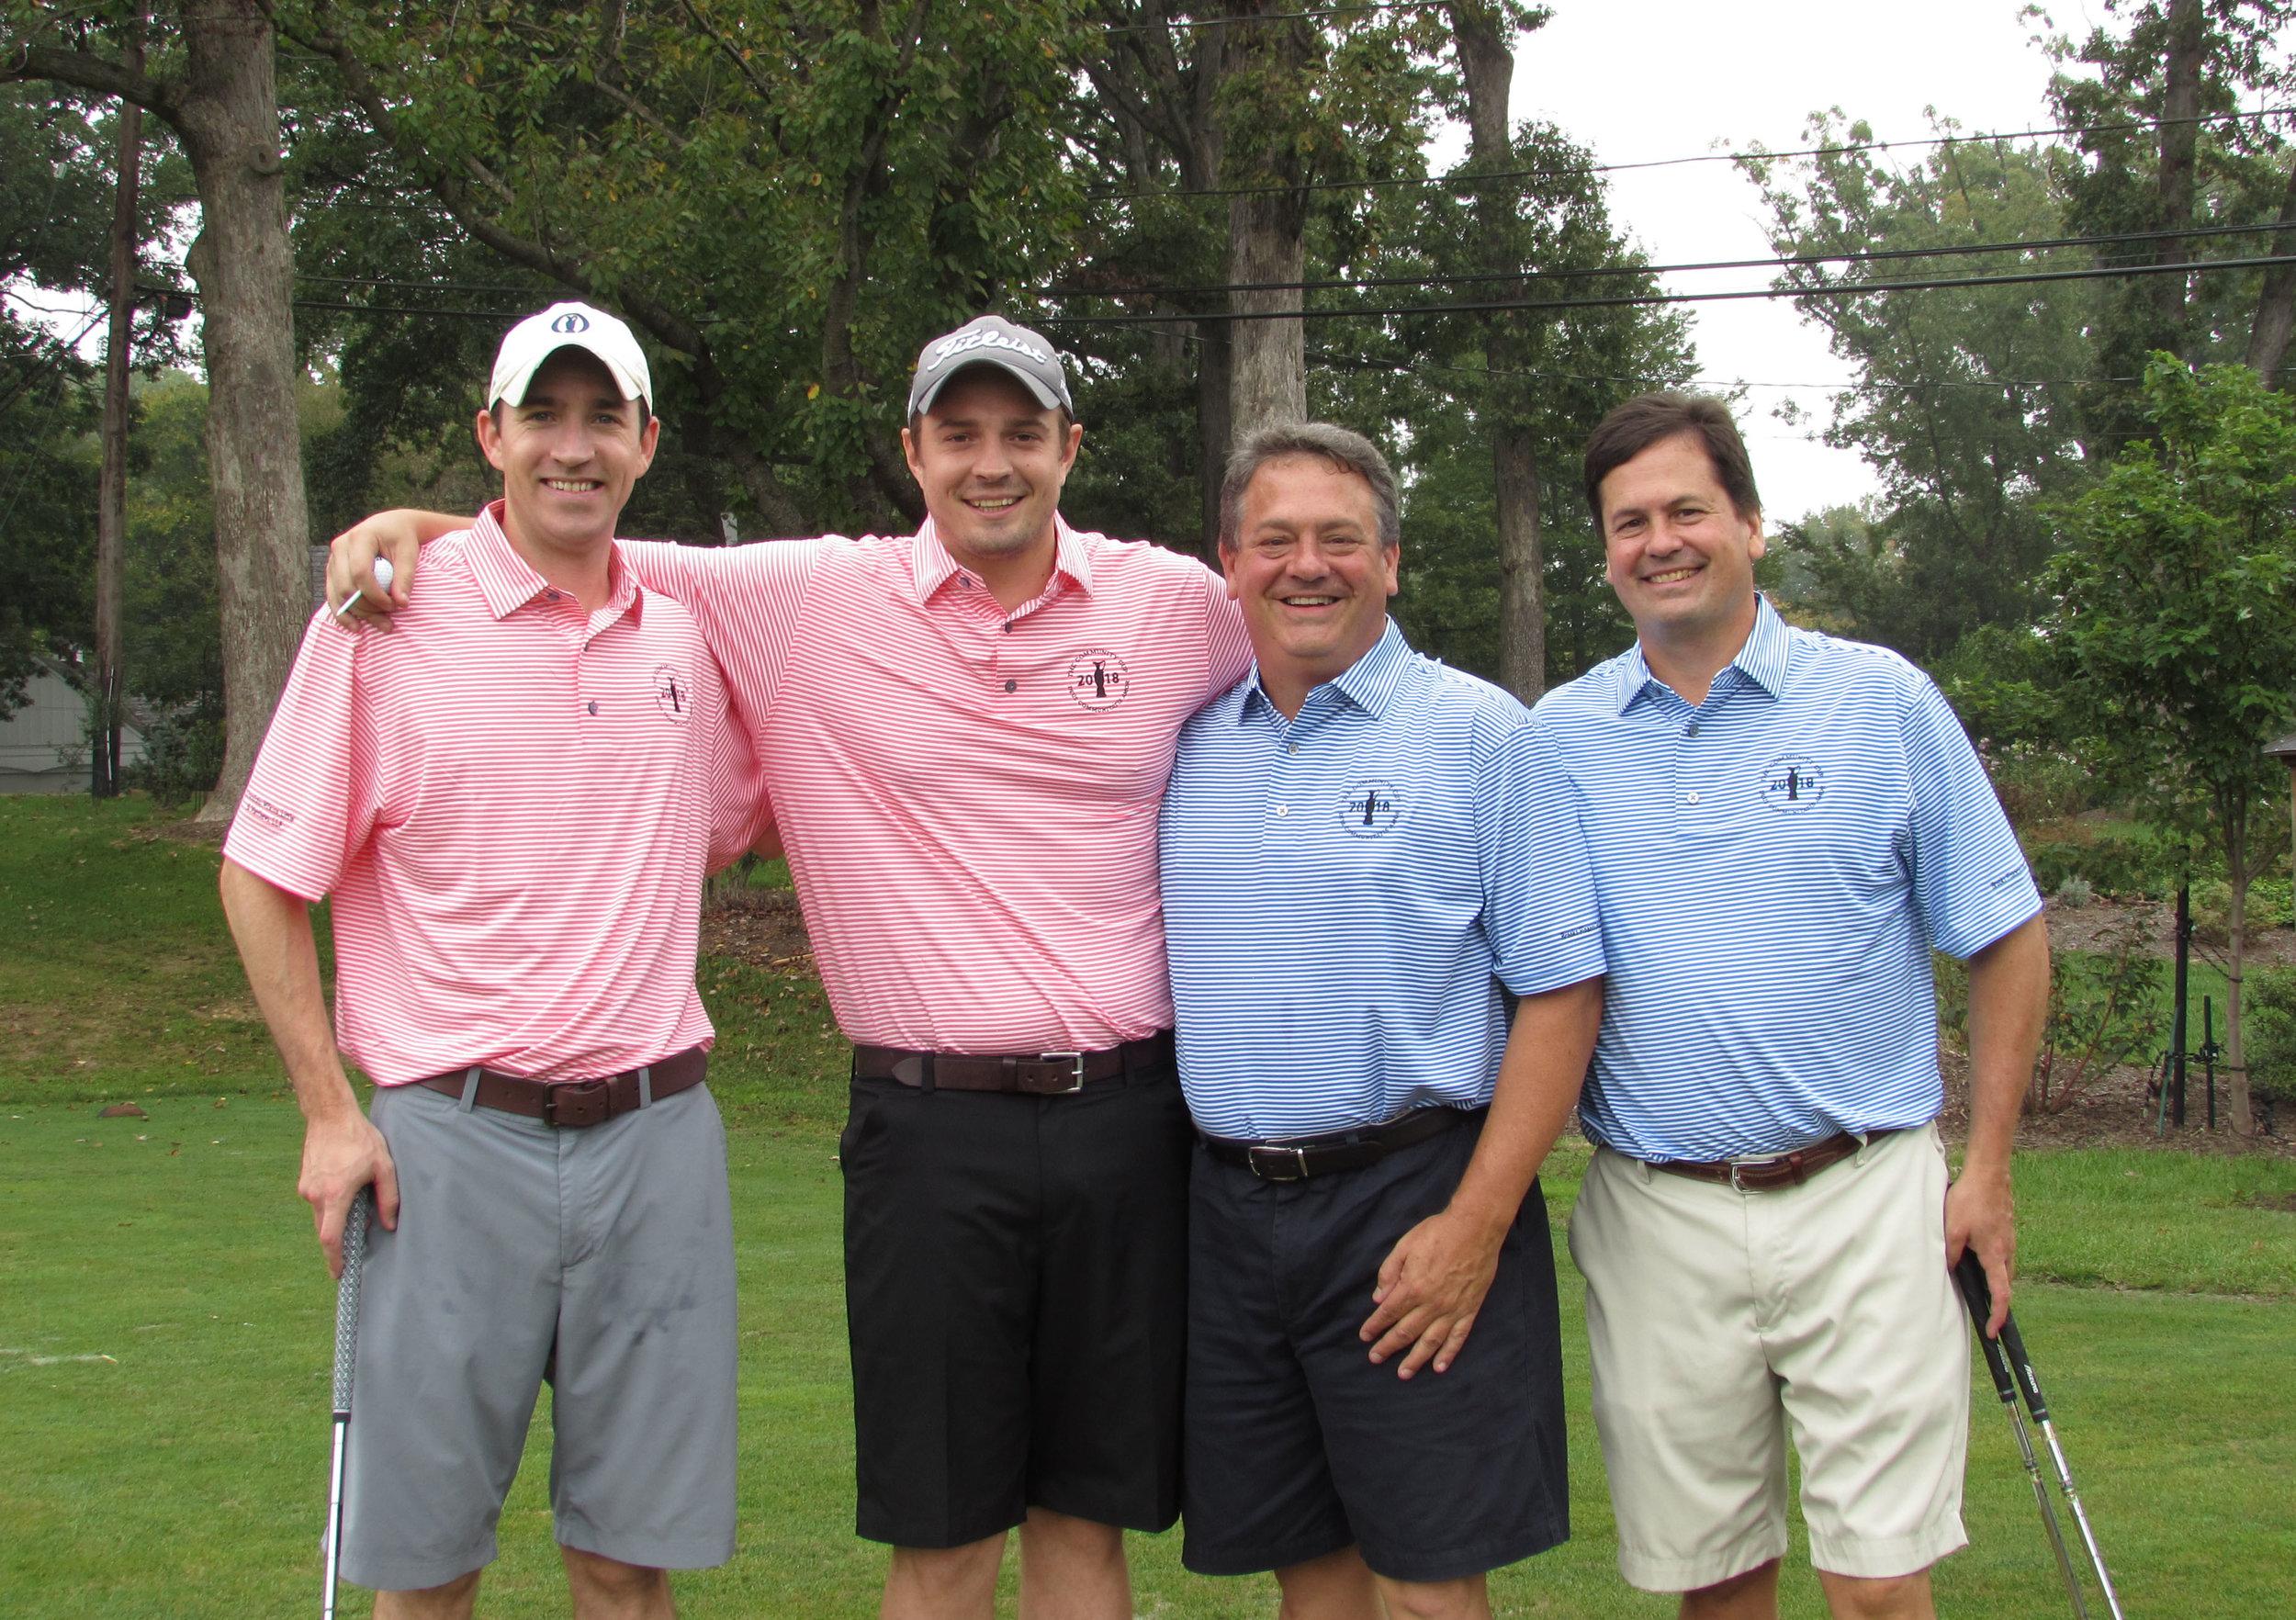 4 Happy Golfers.jpg